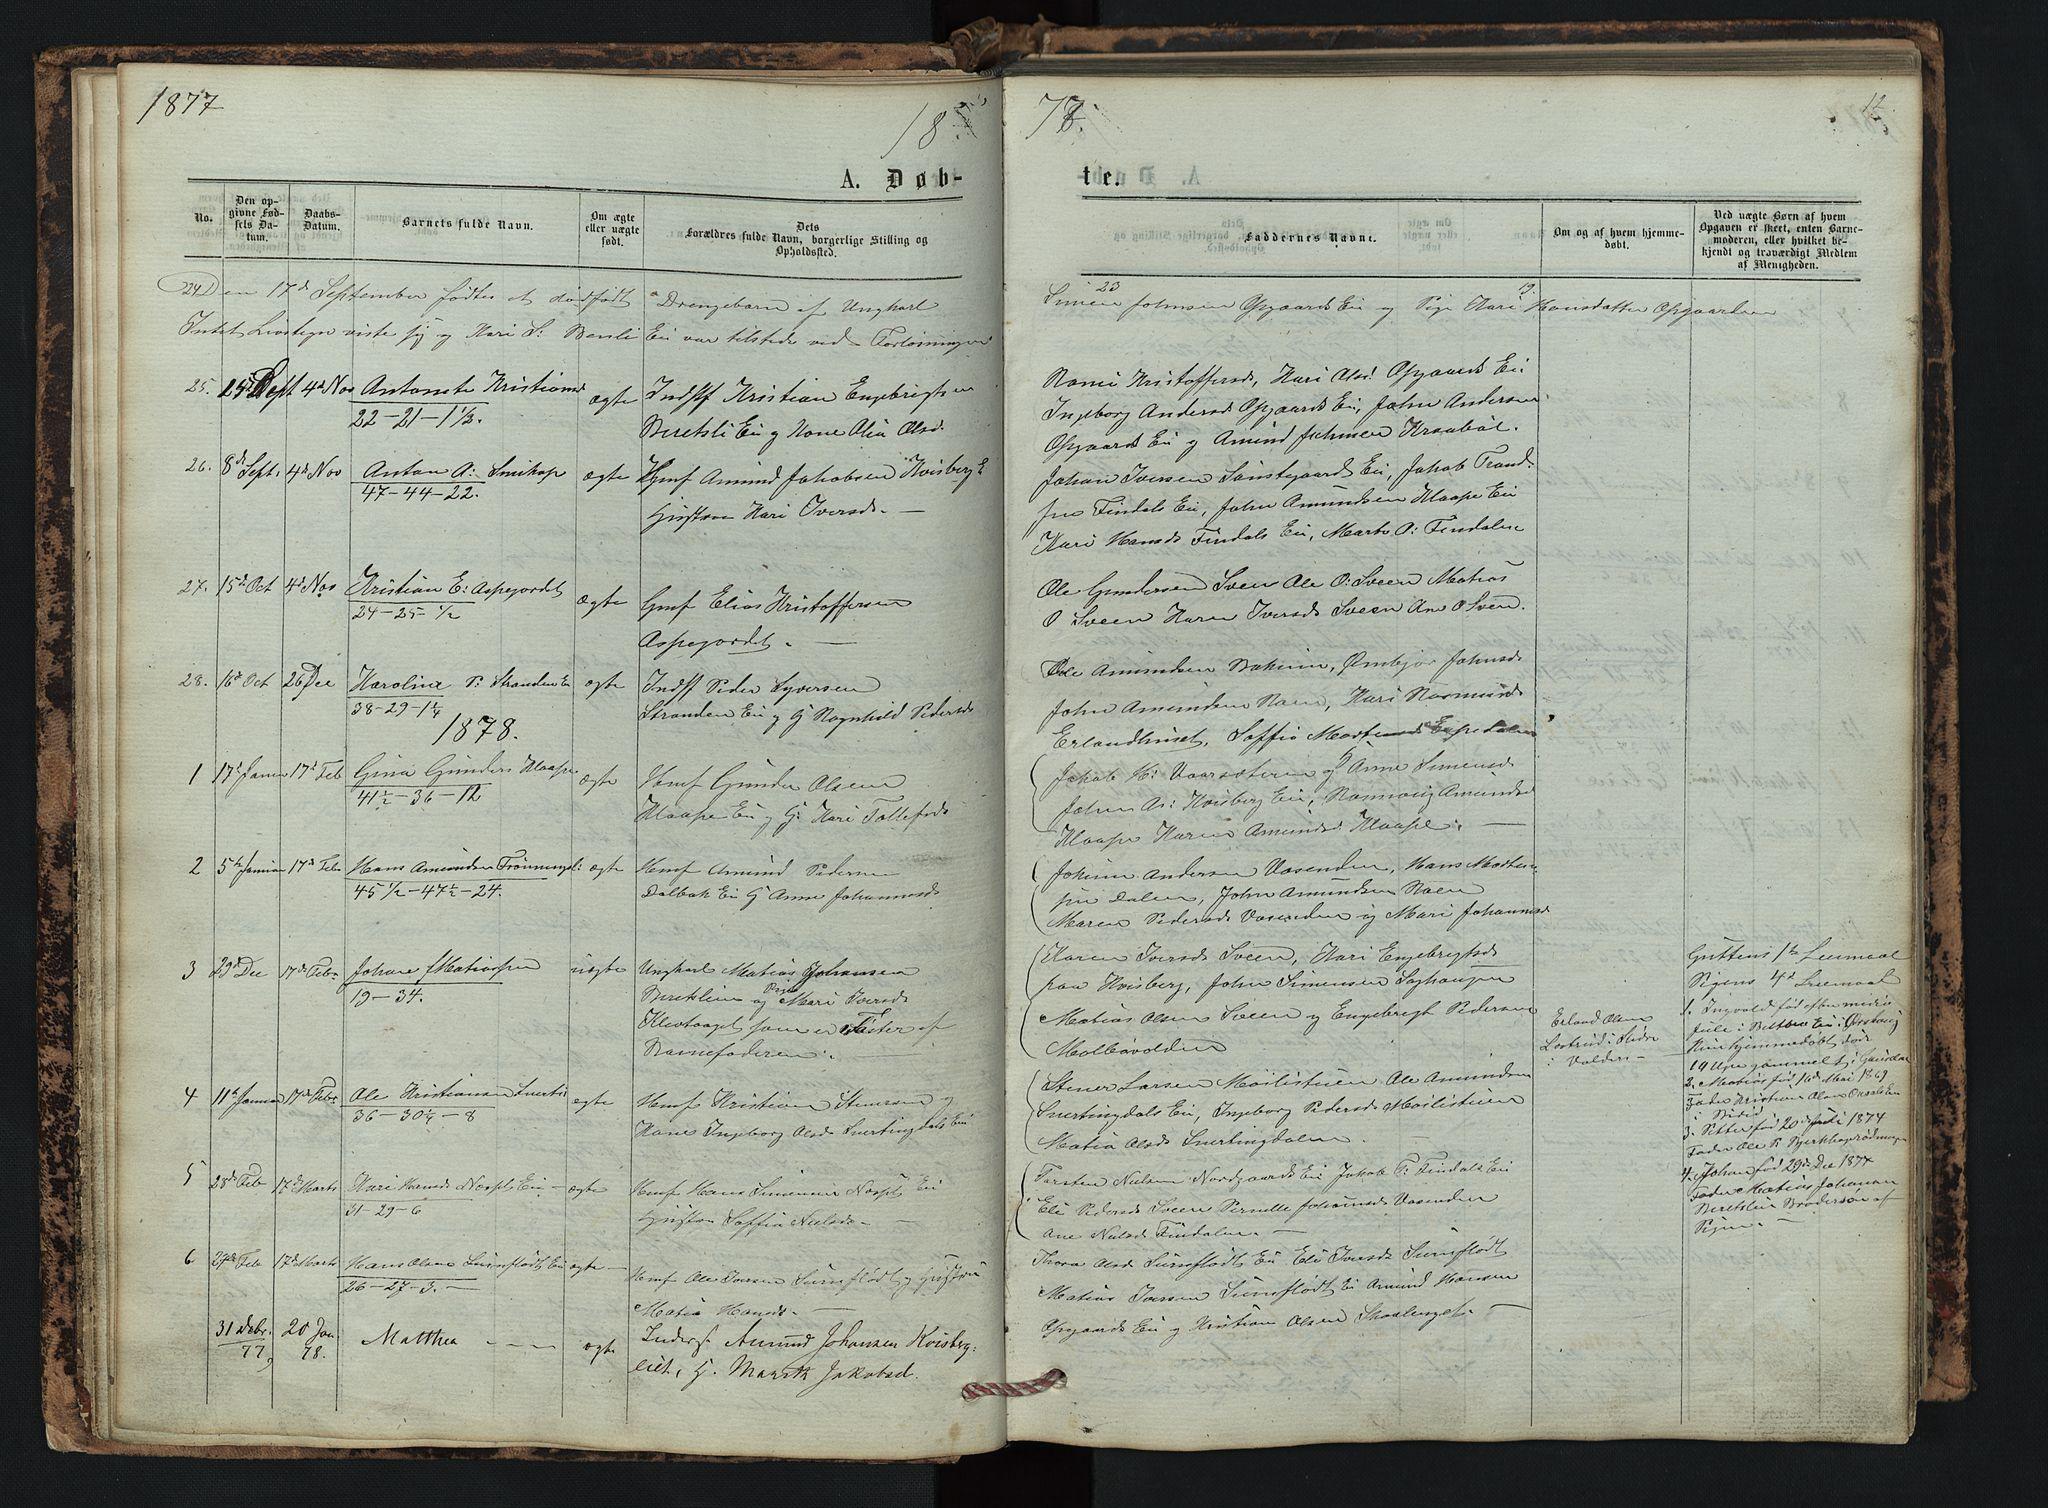 SAH, Vestre Gausdal prestekontor, Klokkerbok nr. 2, 1874-1897, s. 12